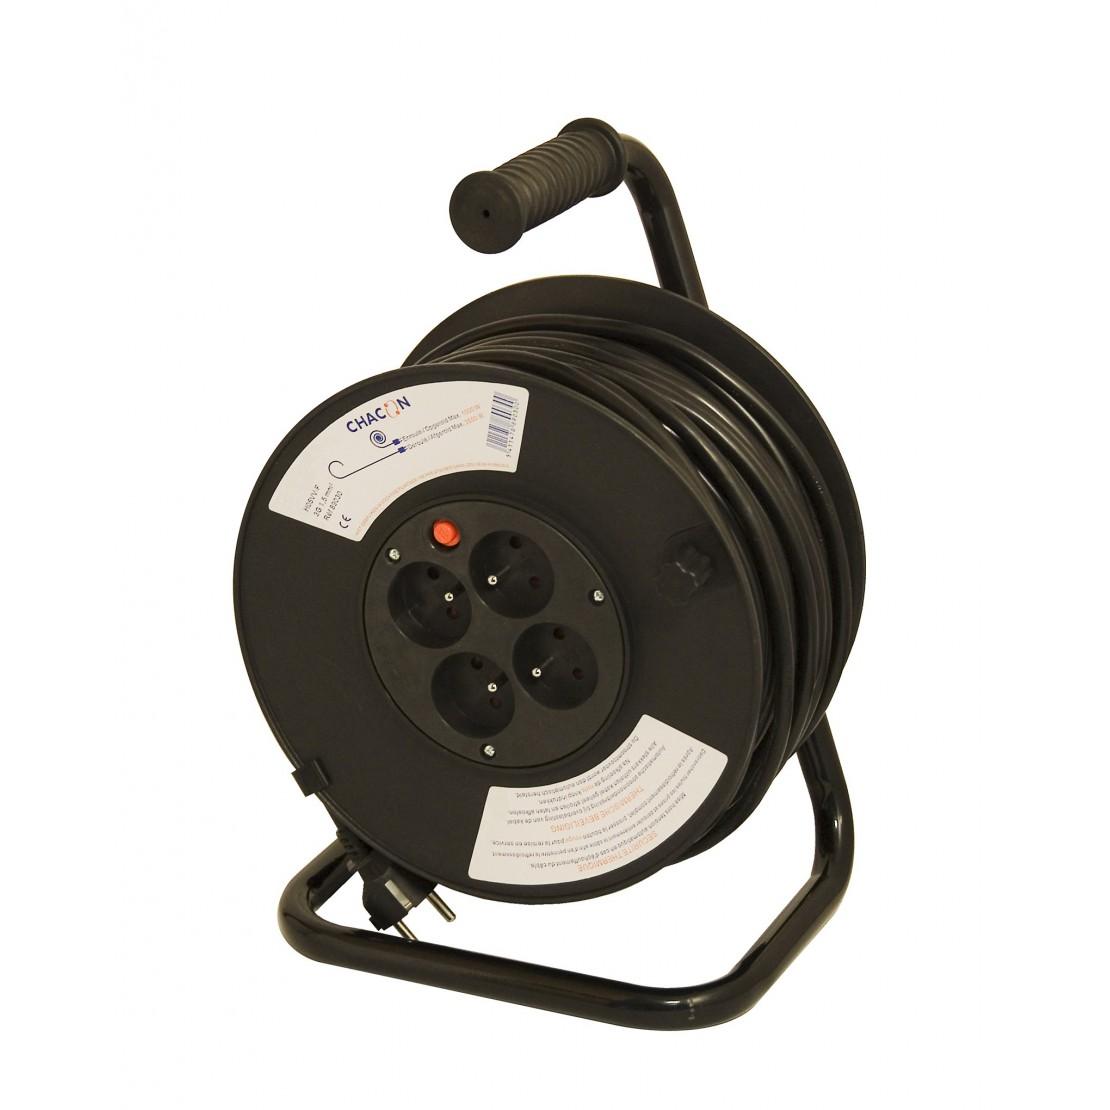 Enrouleur bricolage 4 x 16 A HO5VV-F 3 x 1,5mm2 - 50 m